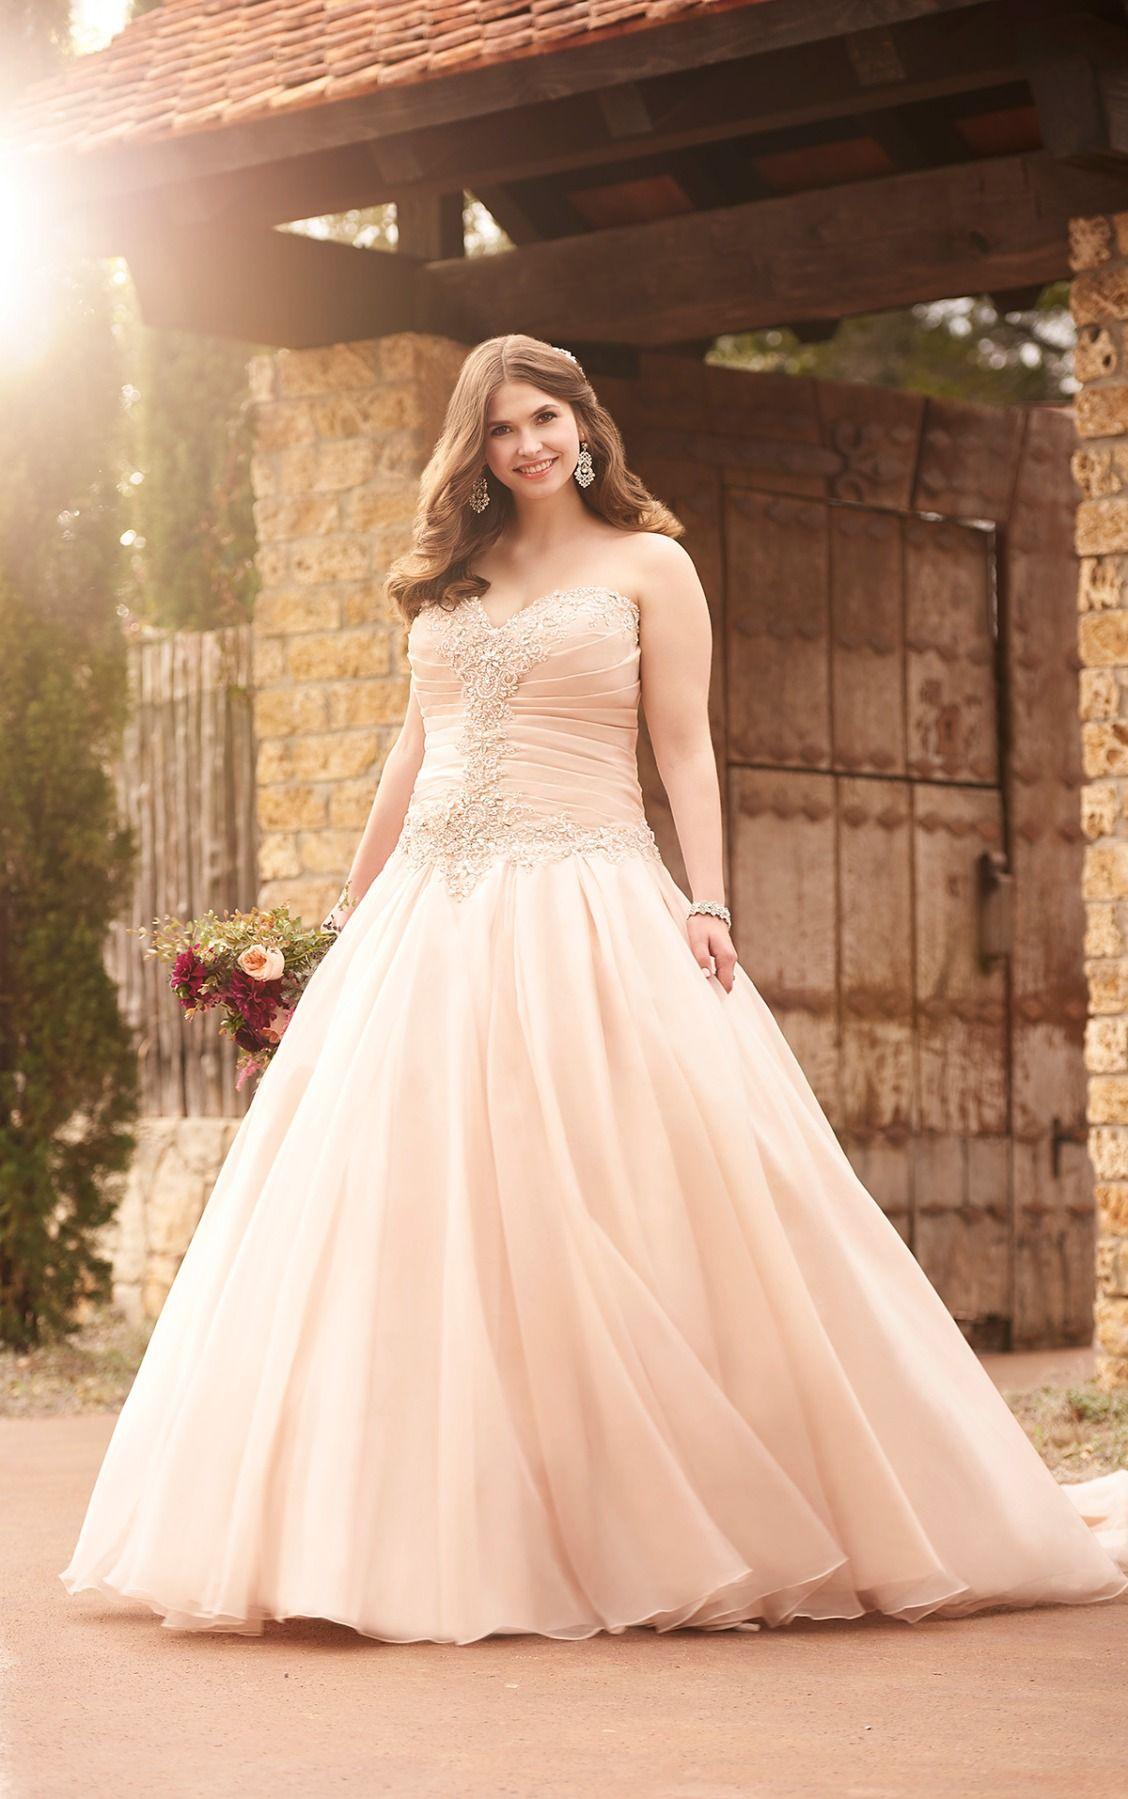 Wedding dresses for curvy brides  Wedding Gowns  Gowns Wedding dress and Princess wedding dresses